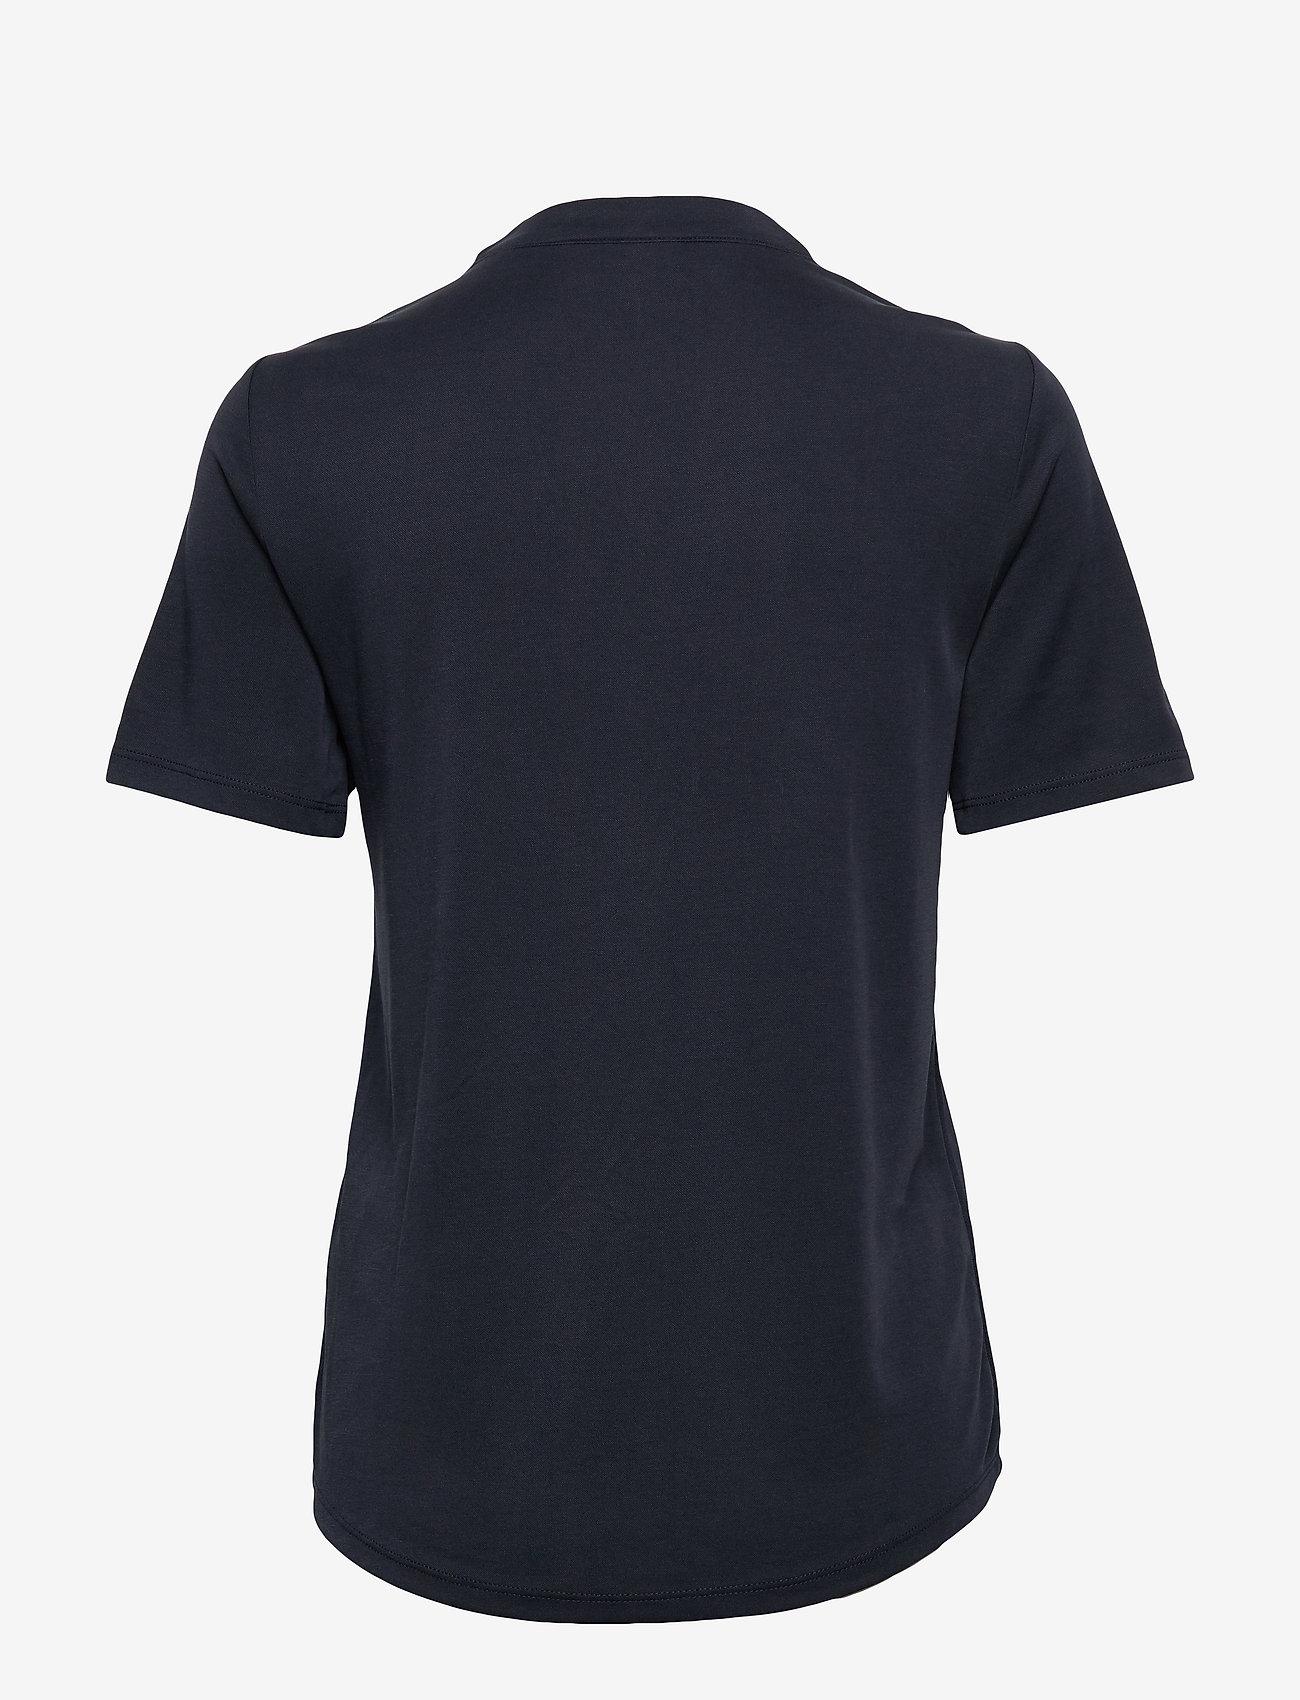 FREE/QUENT - FQYR-SS-BL - t-shirts - salute 19-4011 - 1